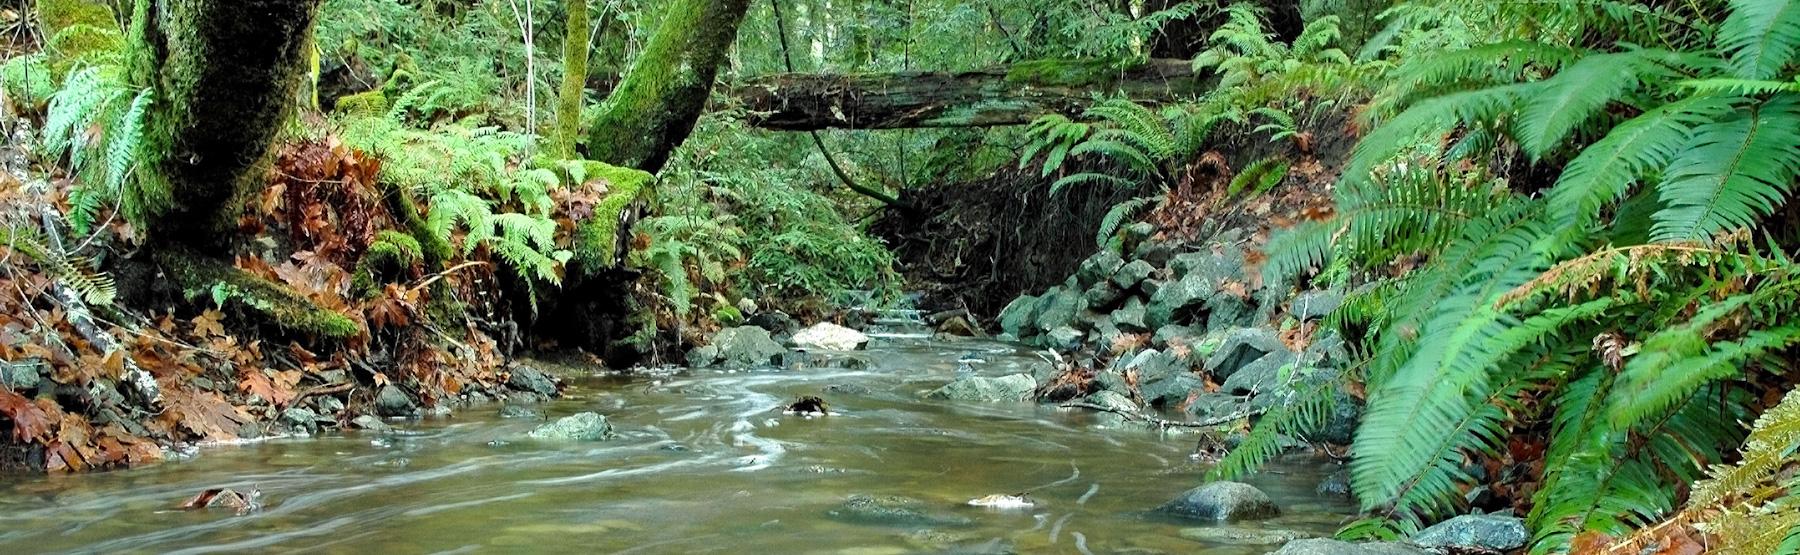 Marin's Clean Water Program